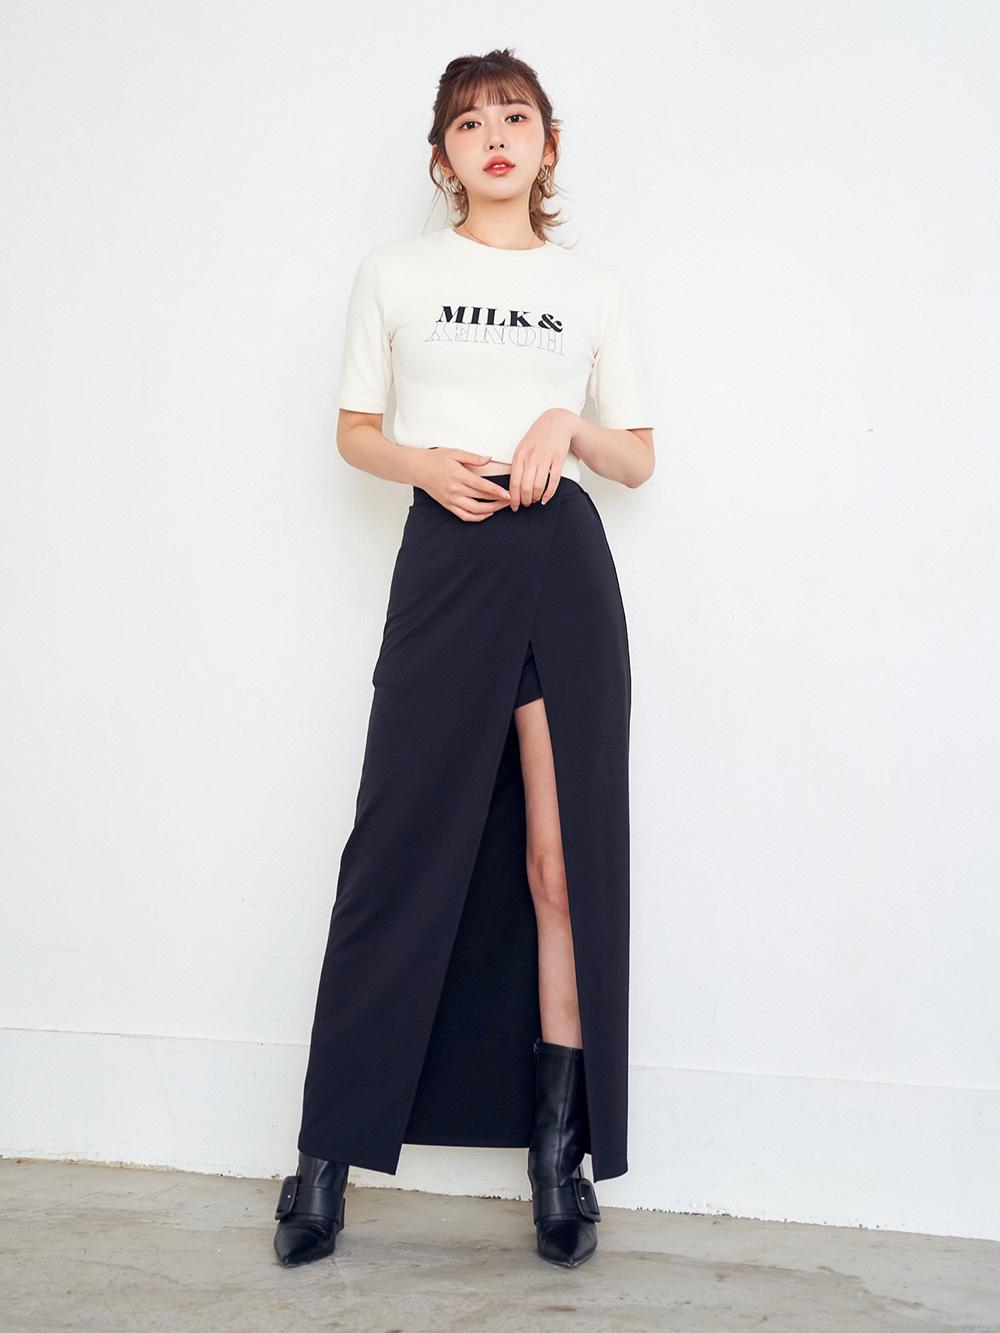 MILK&HONEY Tシャツ